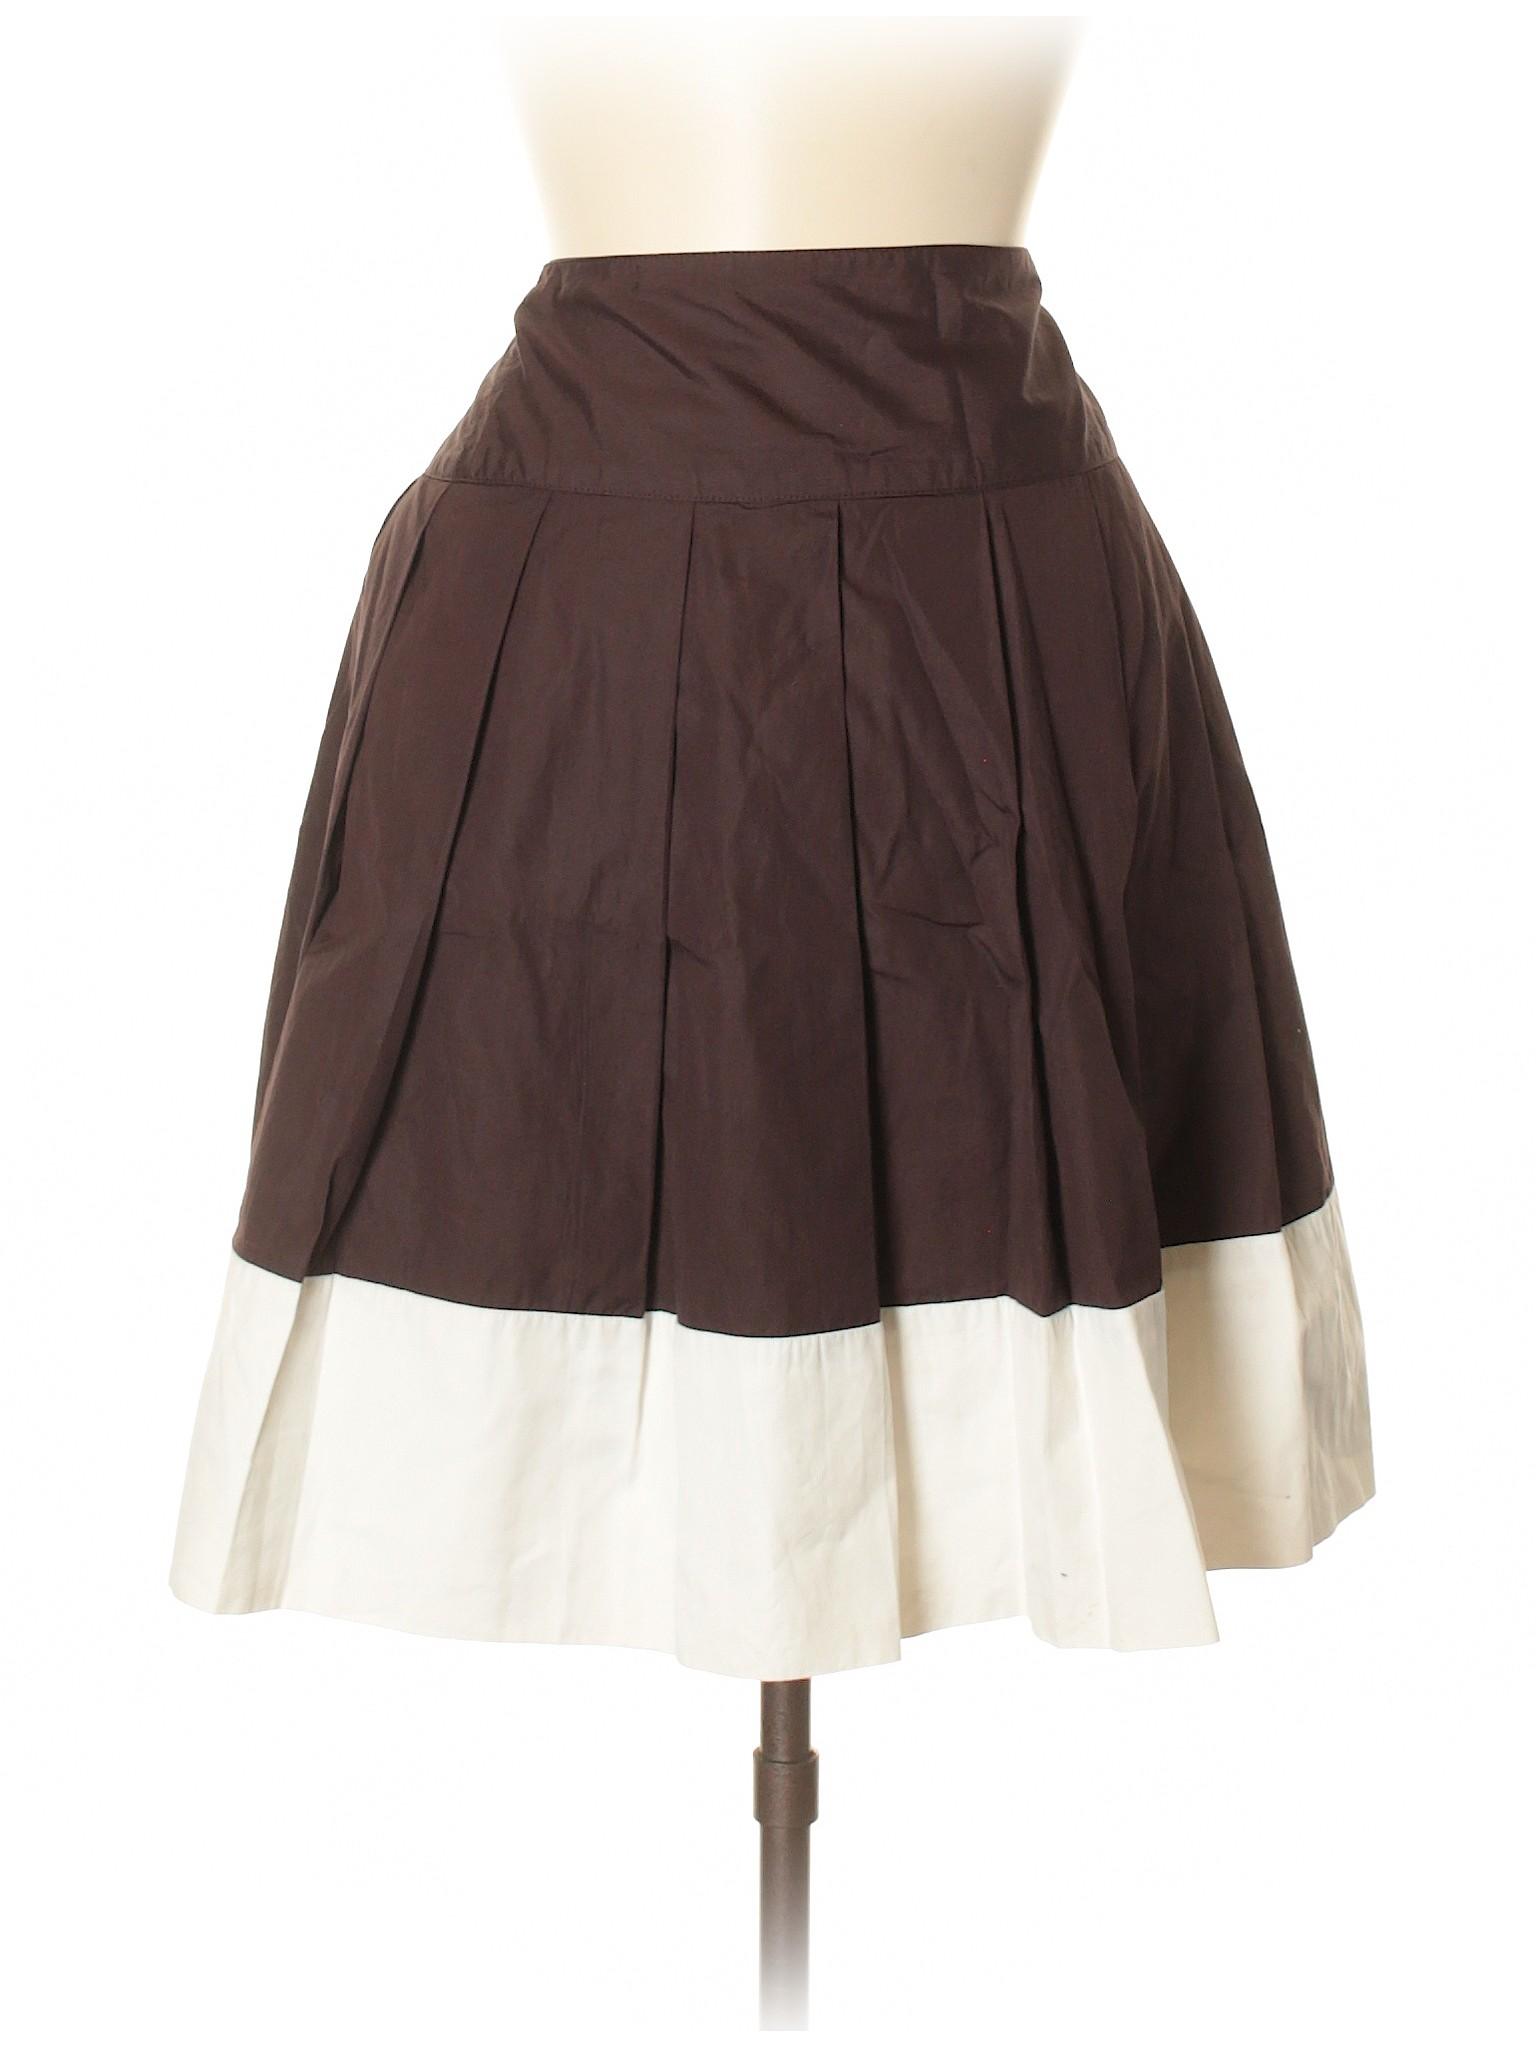 Boutique Skirt Republic Casual Banana leisure 1rWyn1S